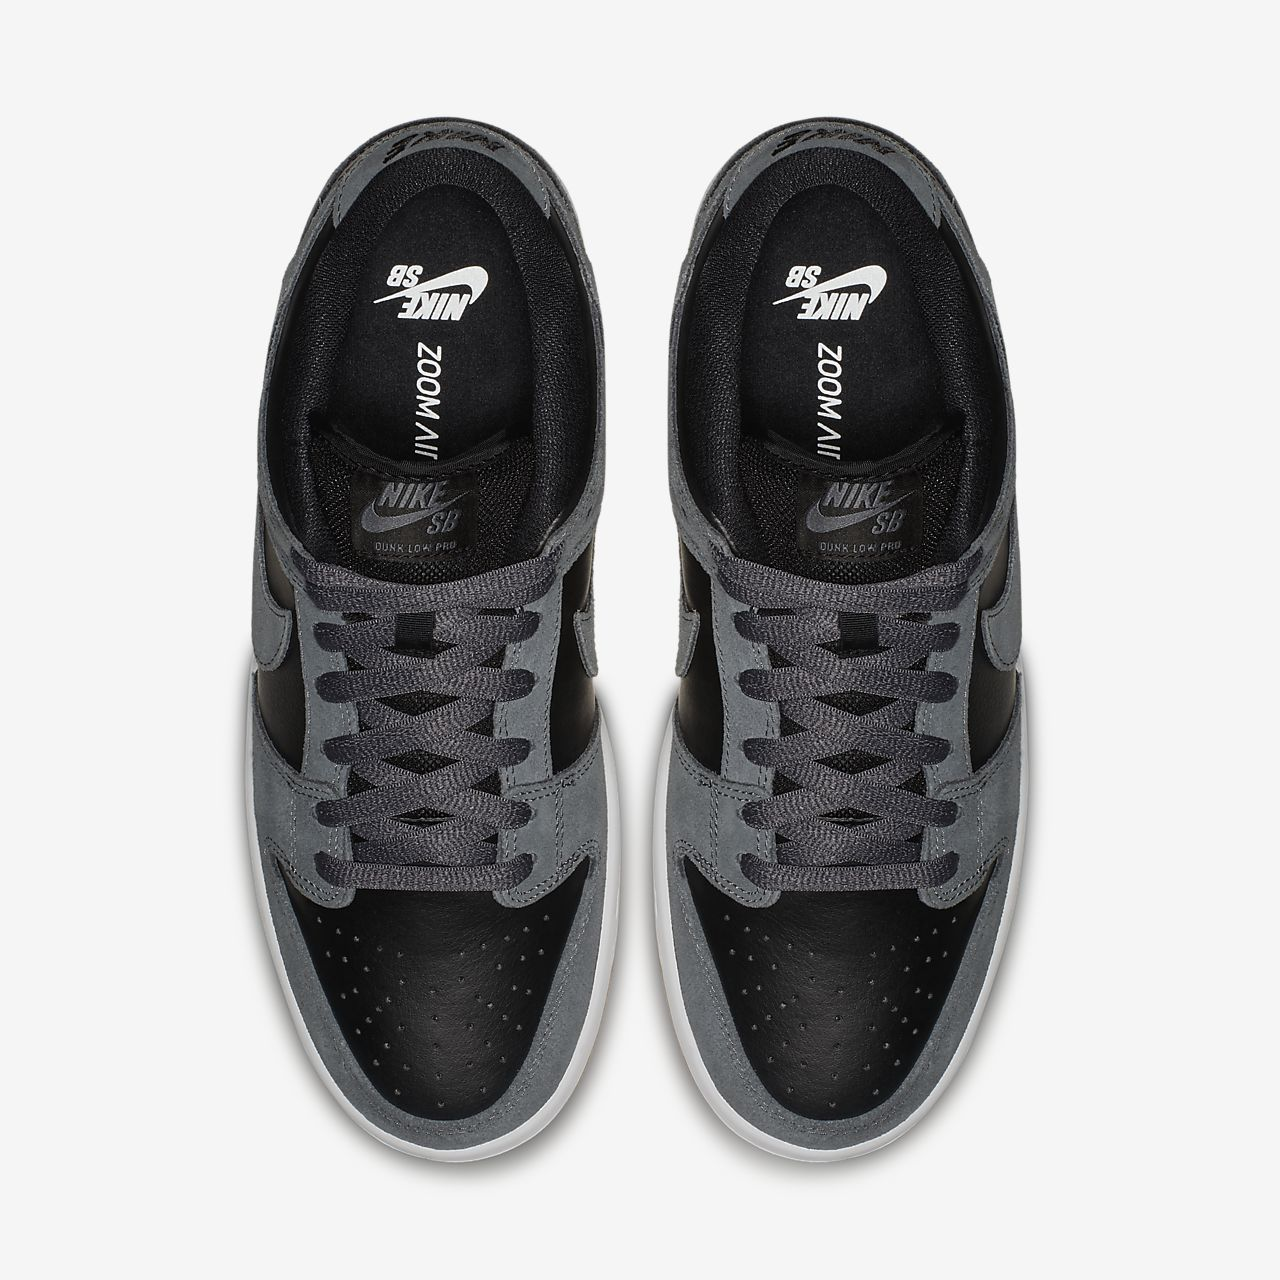 timeless design 868bf 122bd ... Chaussure de skateboard Nike SB Dunk Low TRD pour Homme